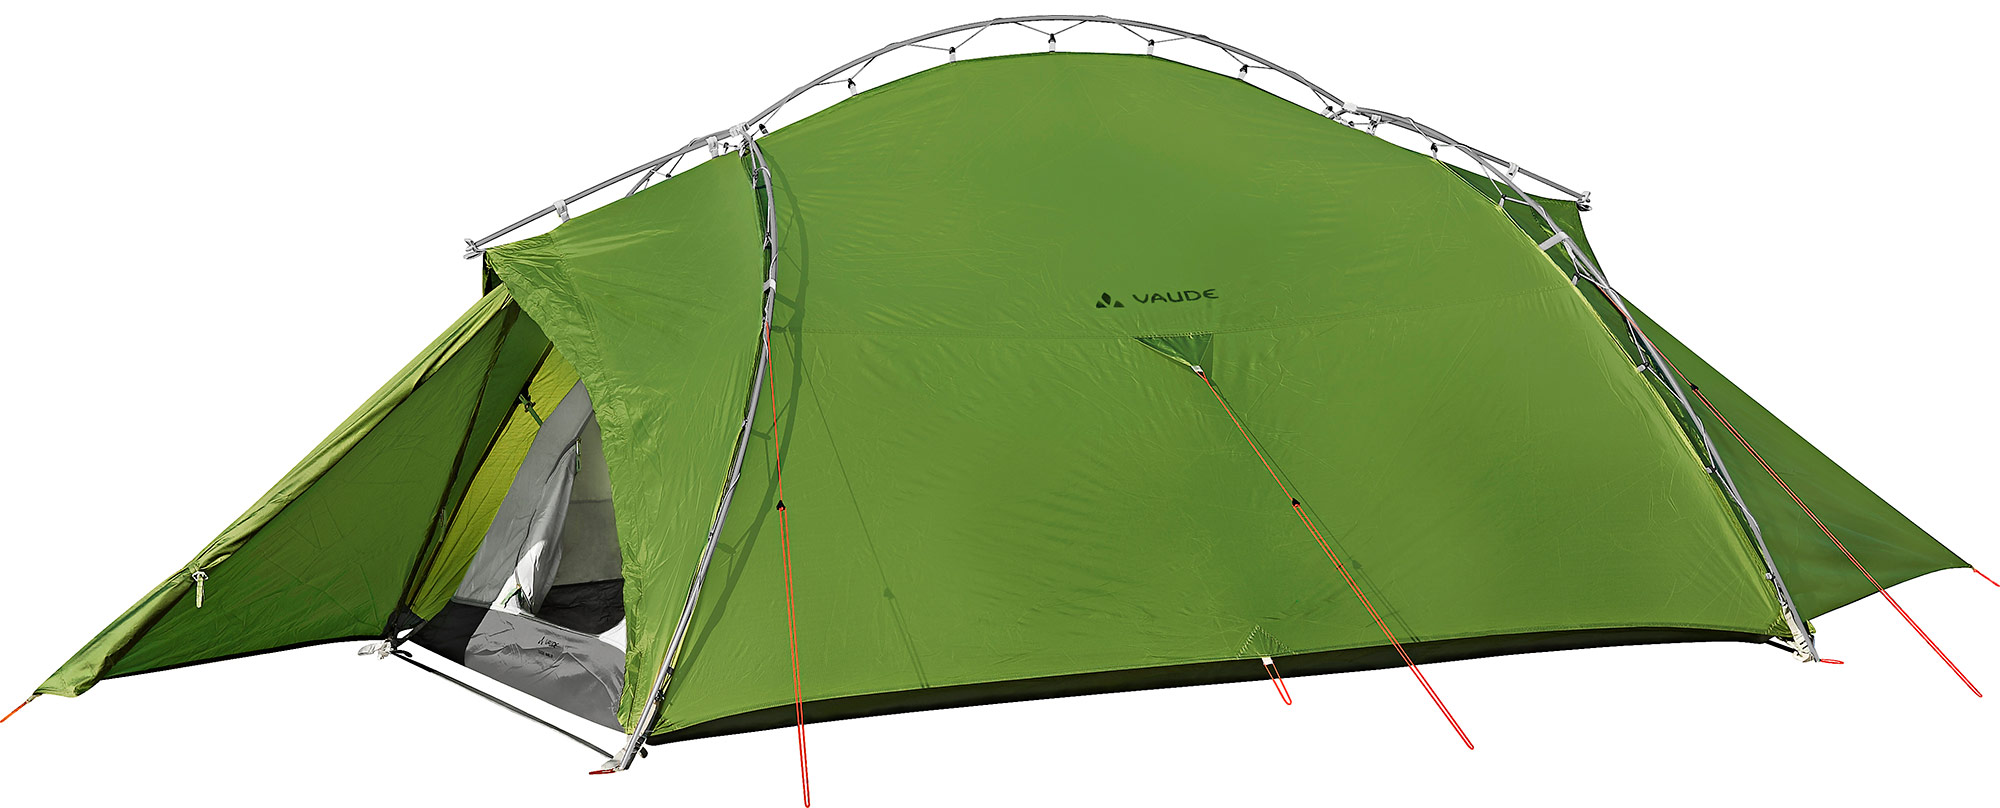 Vaude Палатка 3-местная Mark L 3P